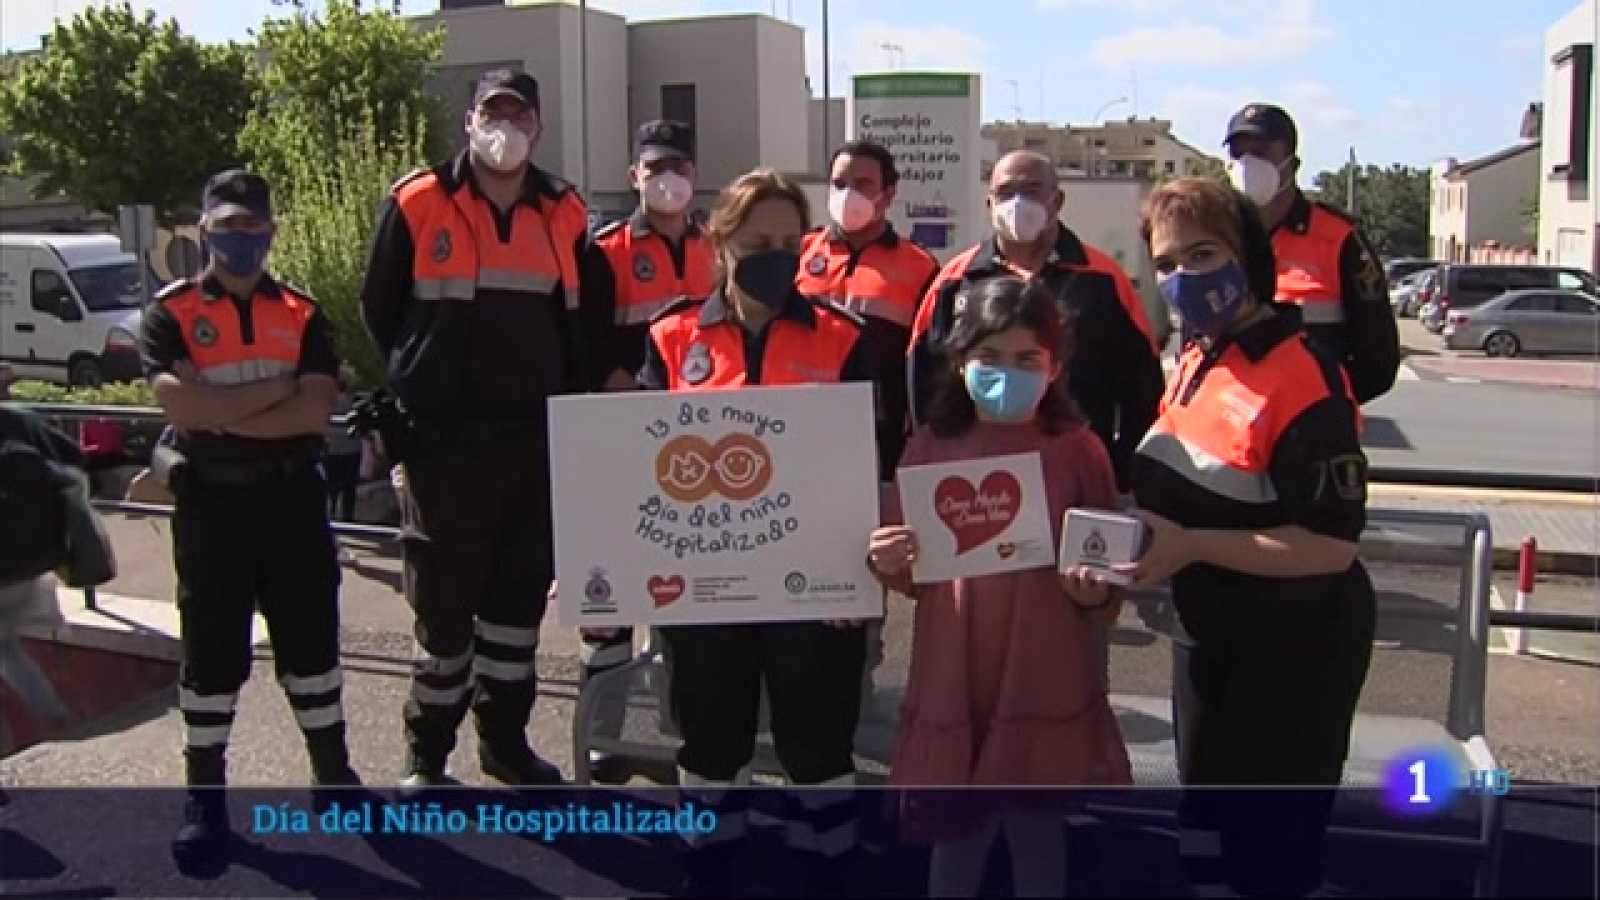 Materno Infantil de Badajoz - 13/05/2021